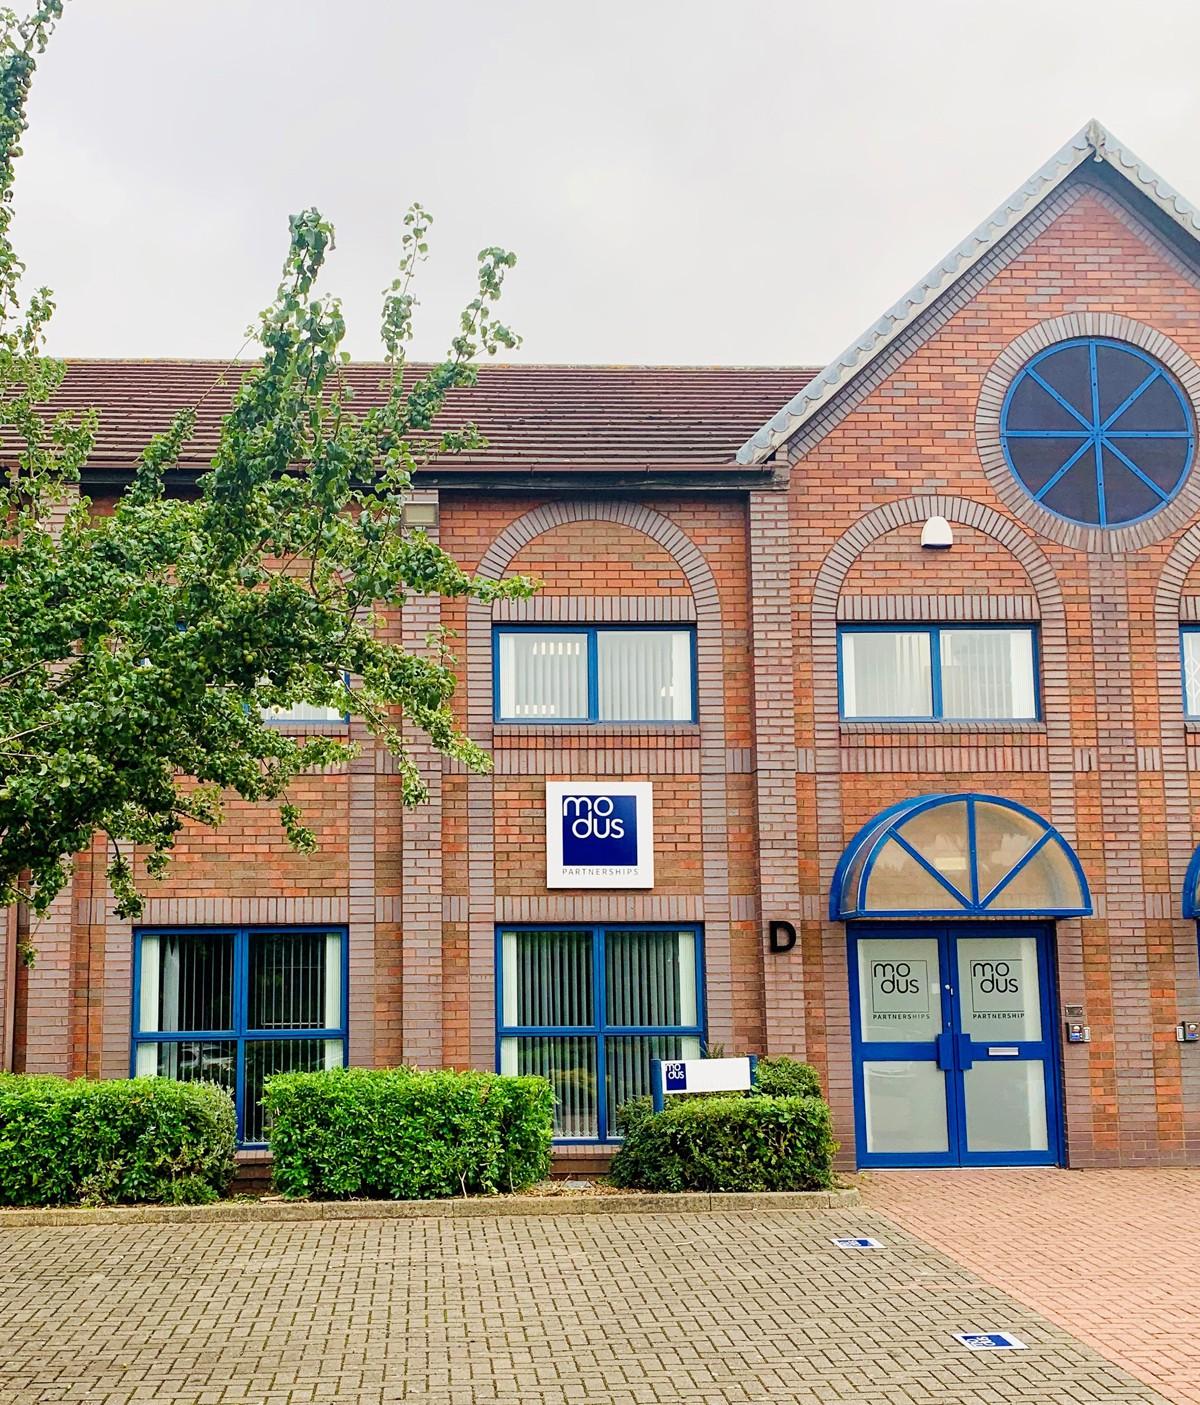 Modus Partnerships Ltd. Developers of affordable housing across the midlands